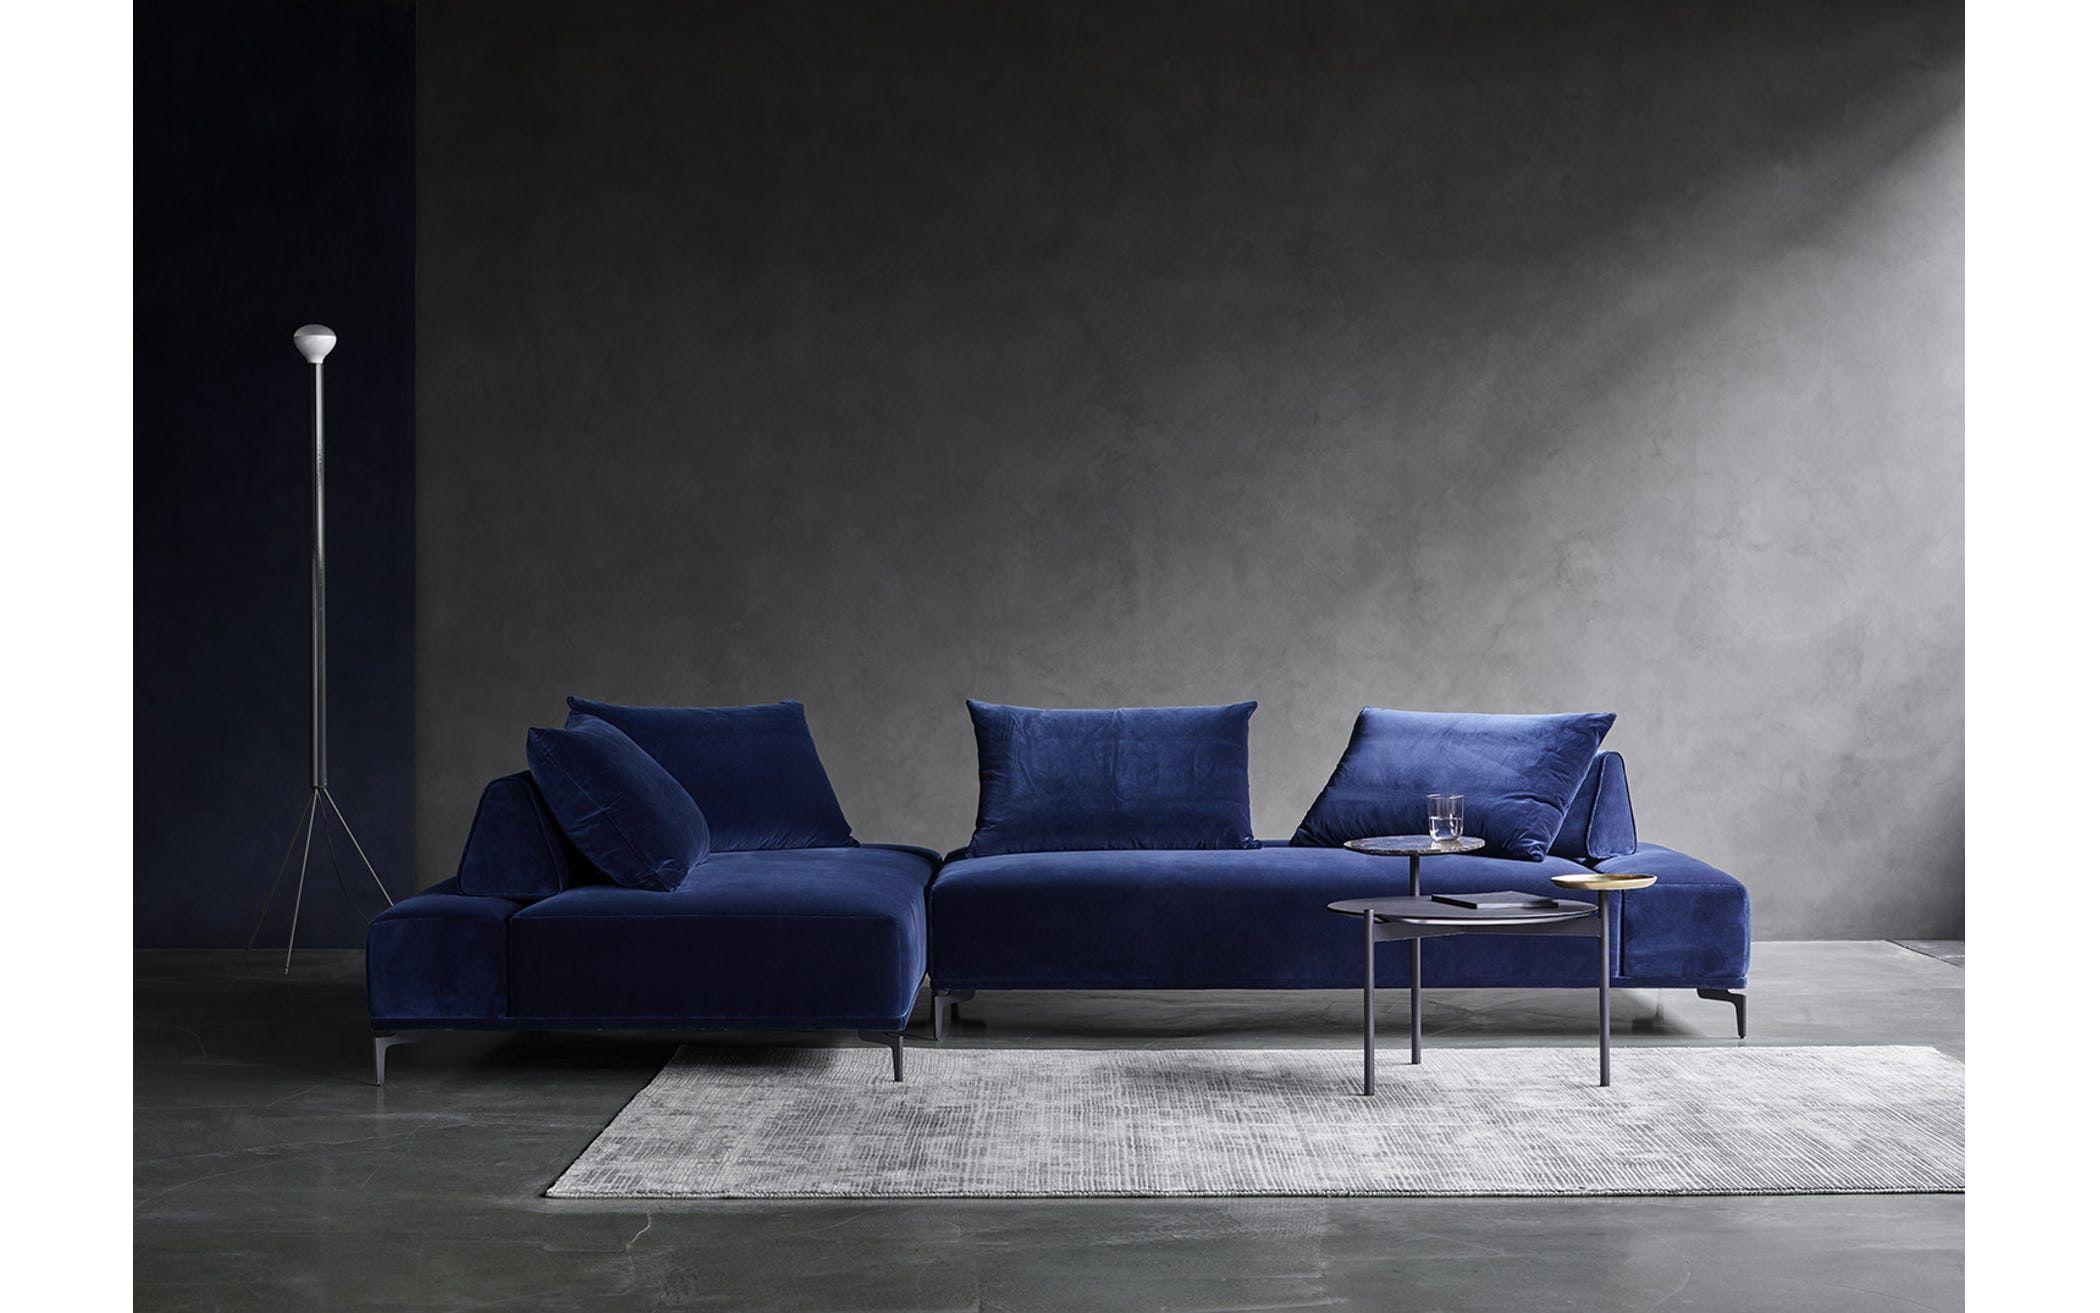 Define Sofa by Wendelbo | Modular sofa, Contemporary ...